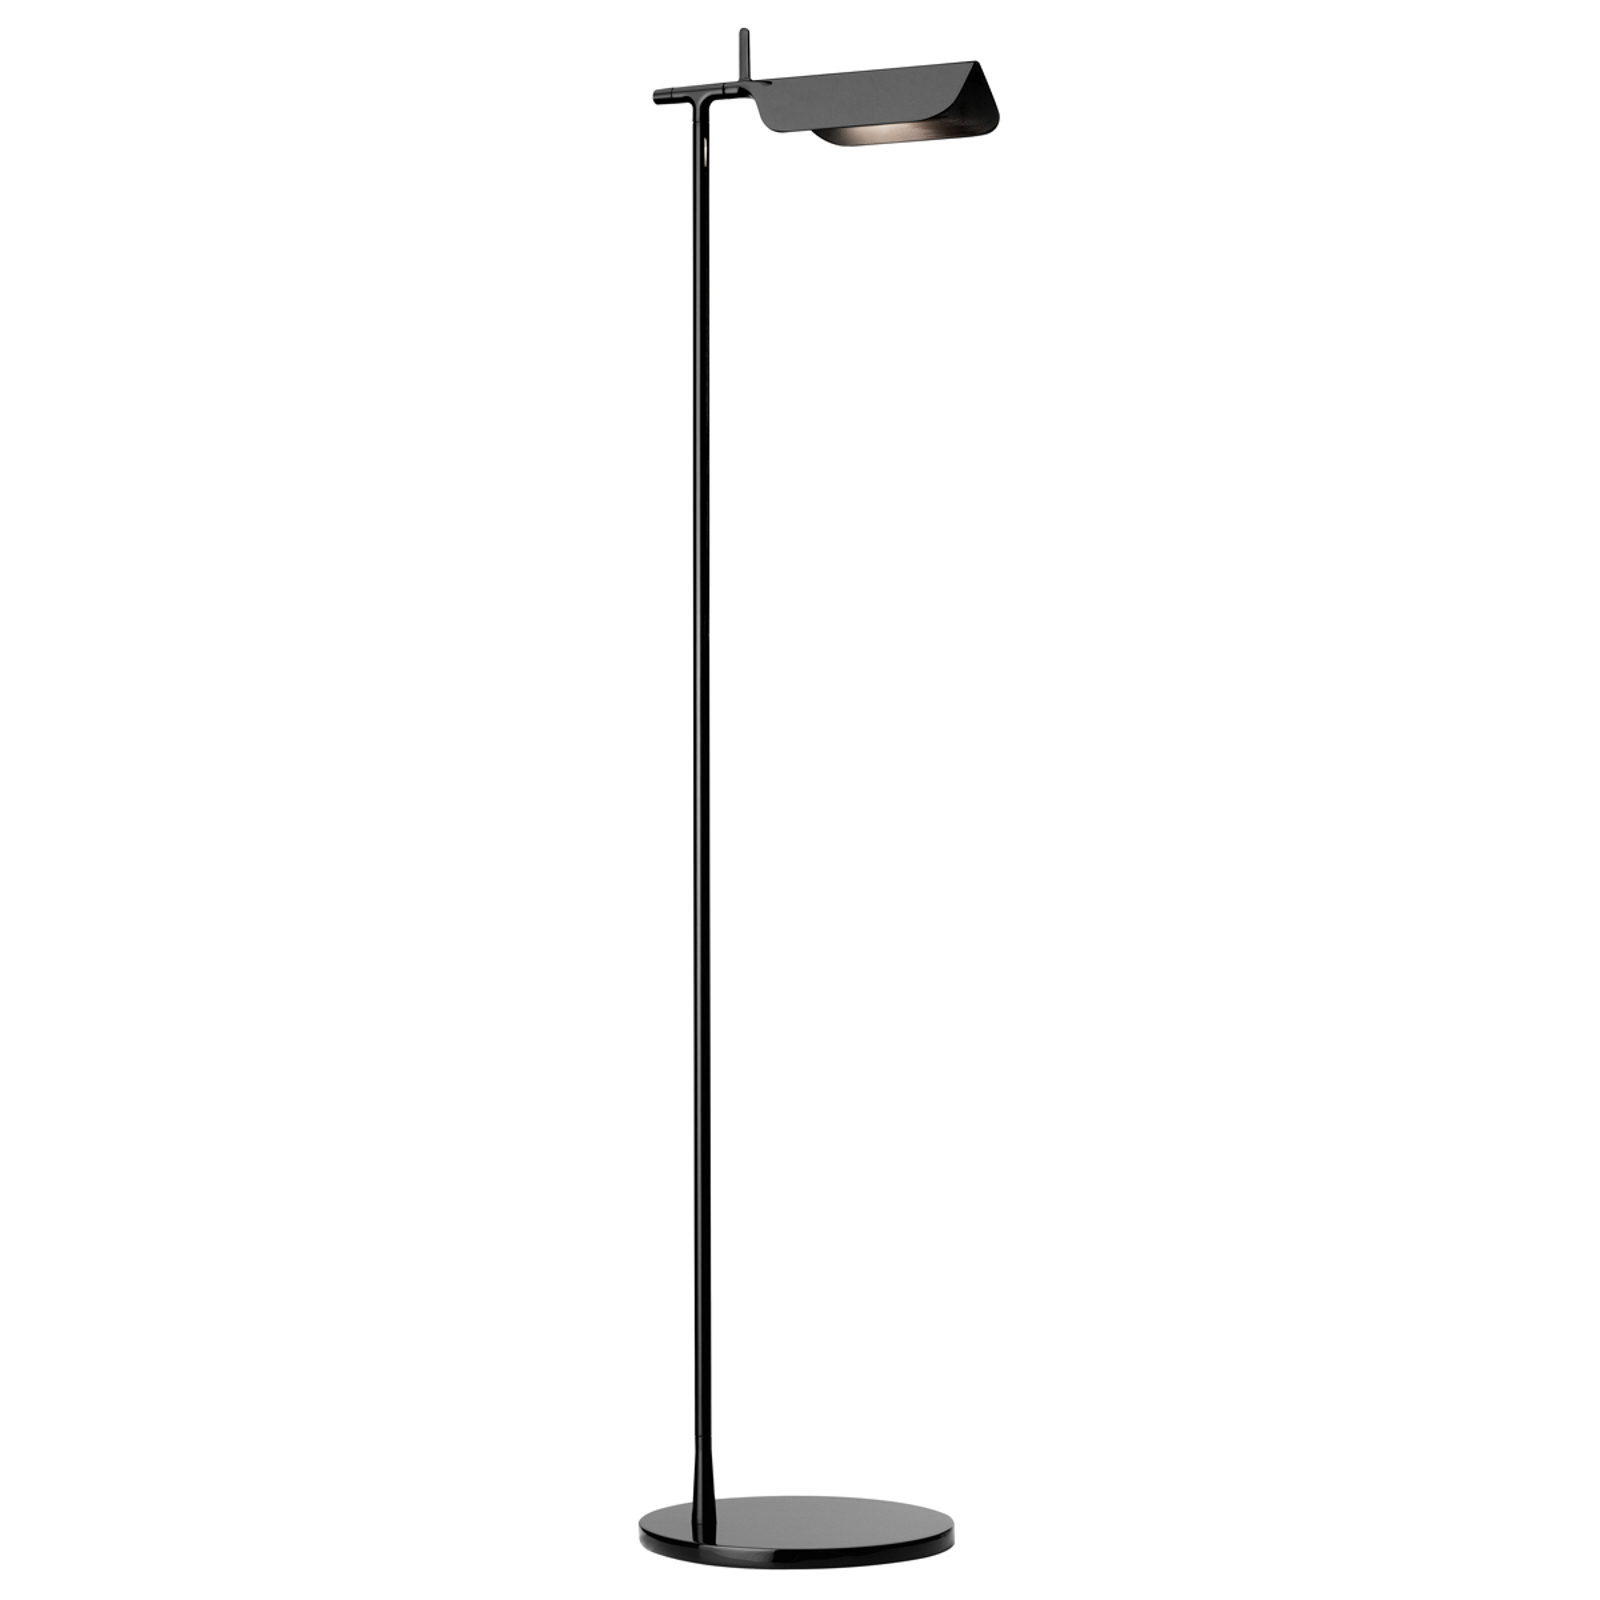 FLOS Tab LED-Stehleuchte, schwarz